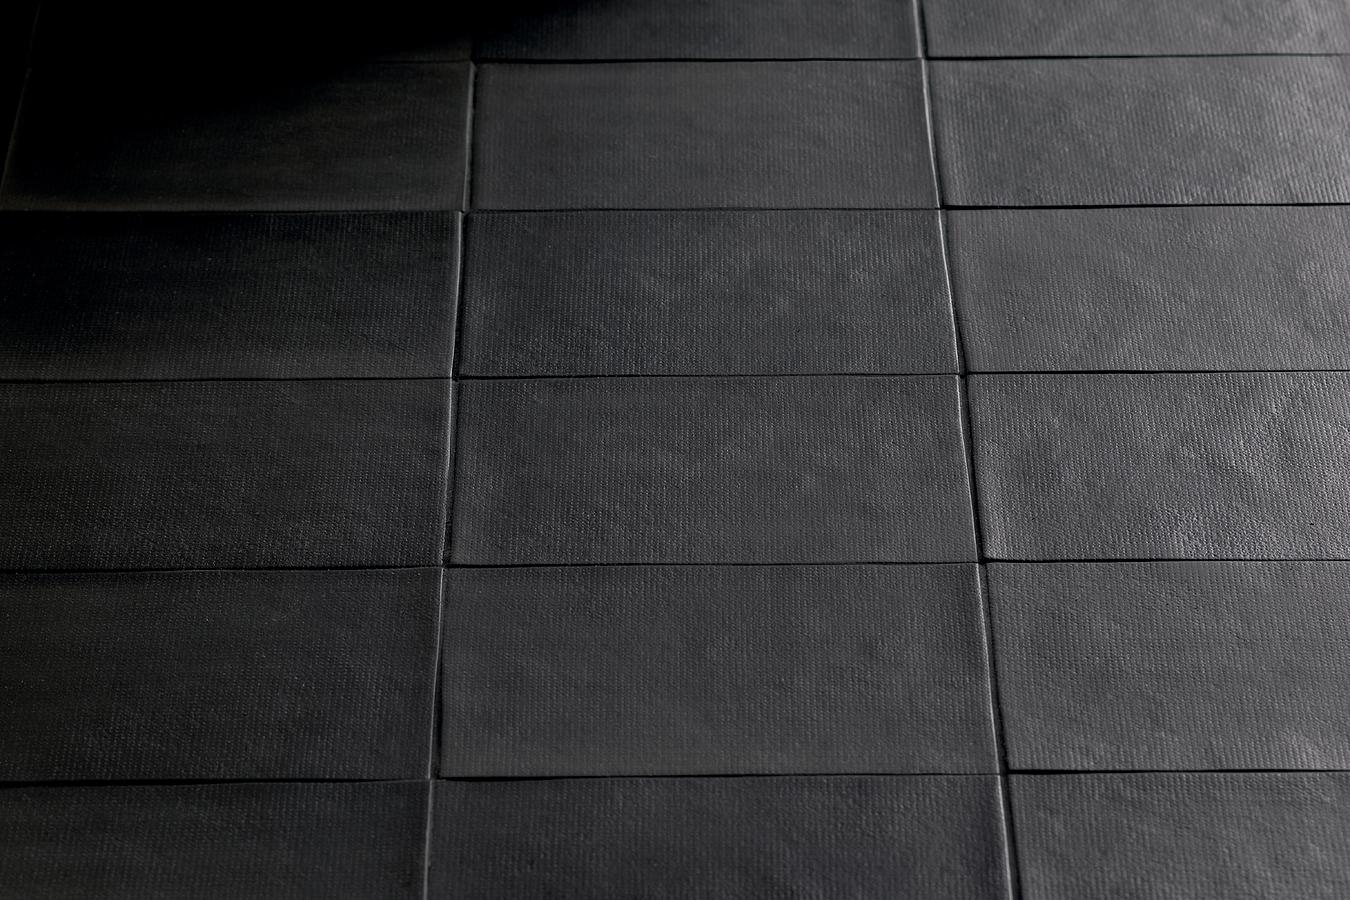 gr s c rame bas relief de mutina tile expert fournisseur de carrelage italien et espagnol en. Black Bedroom Furniture Sets. Home Design Ideas